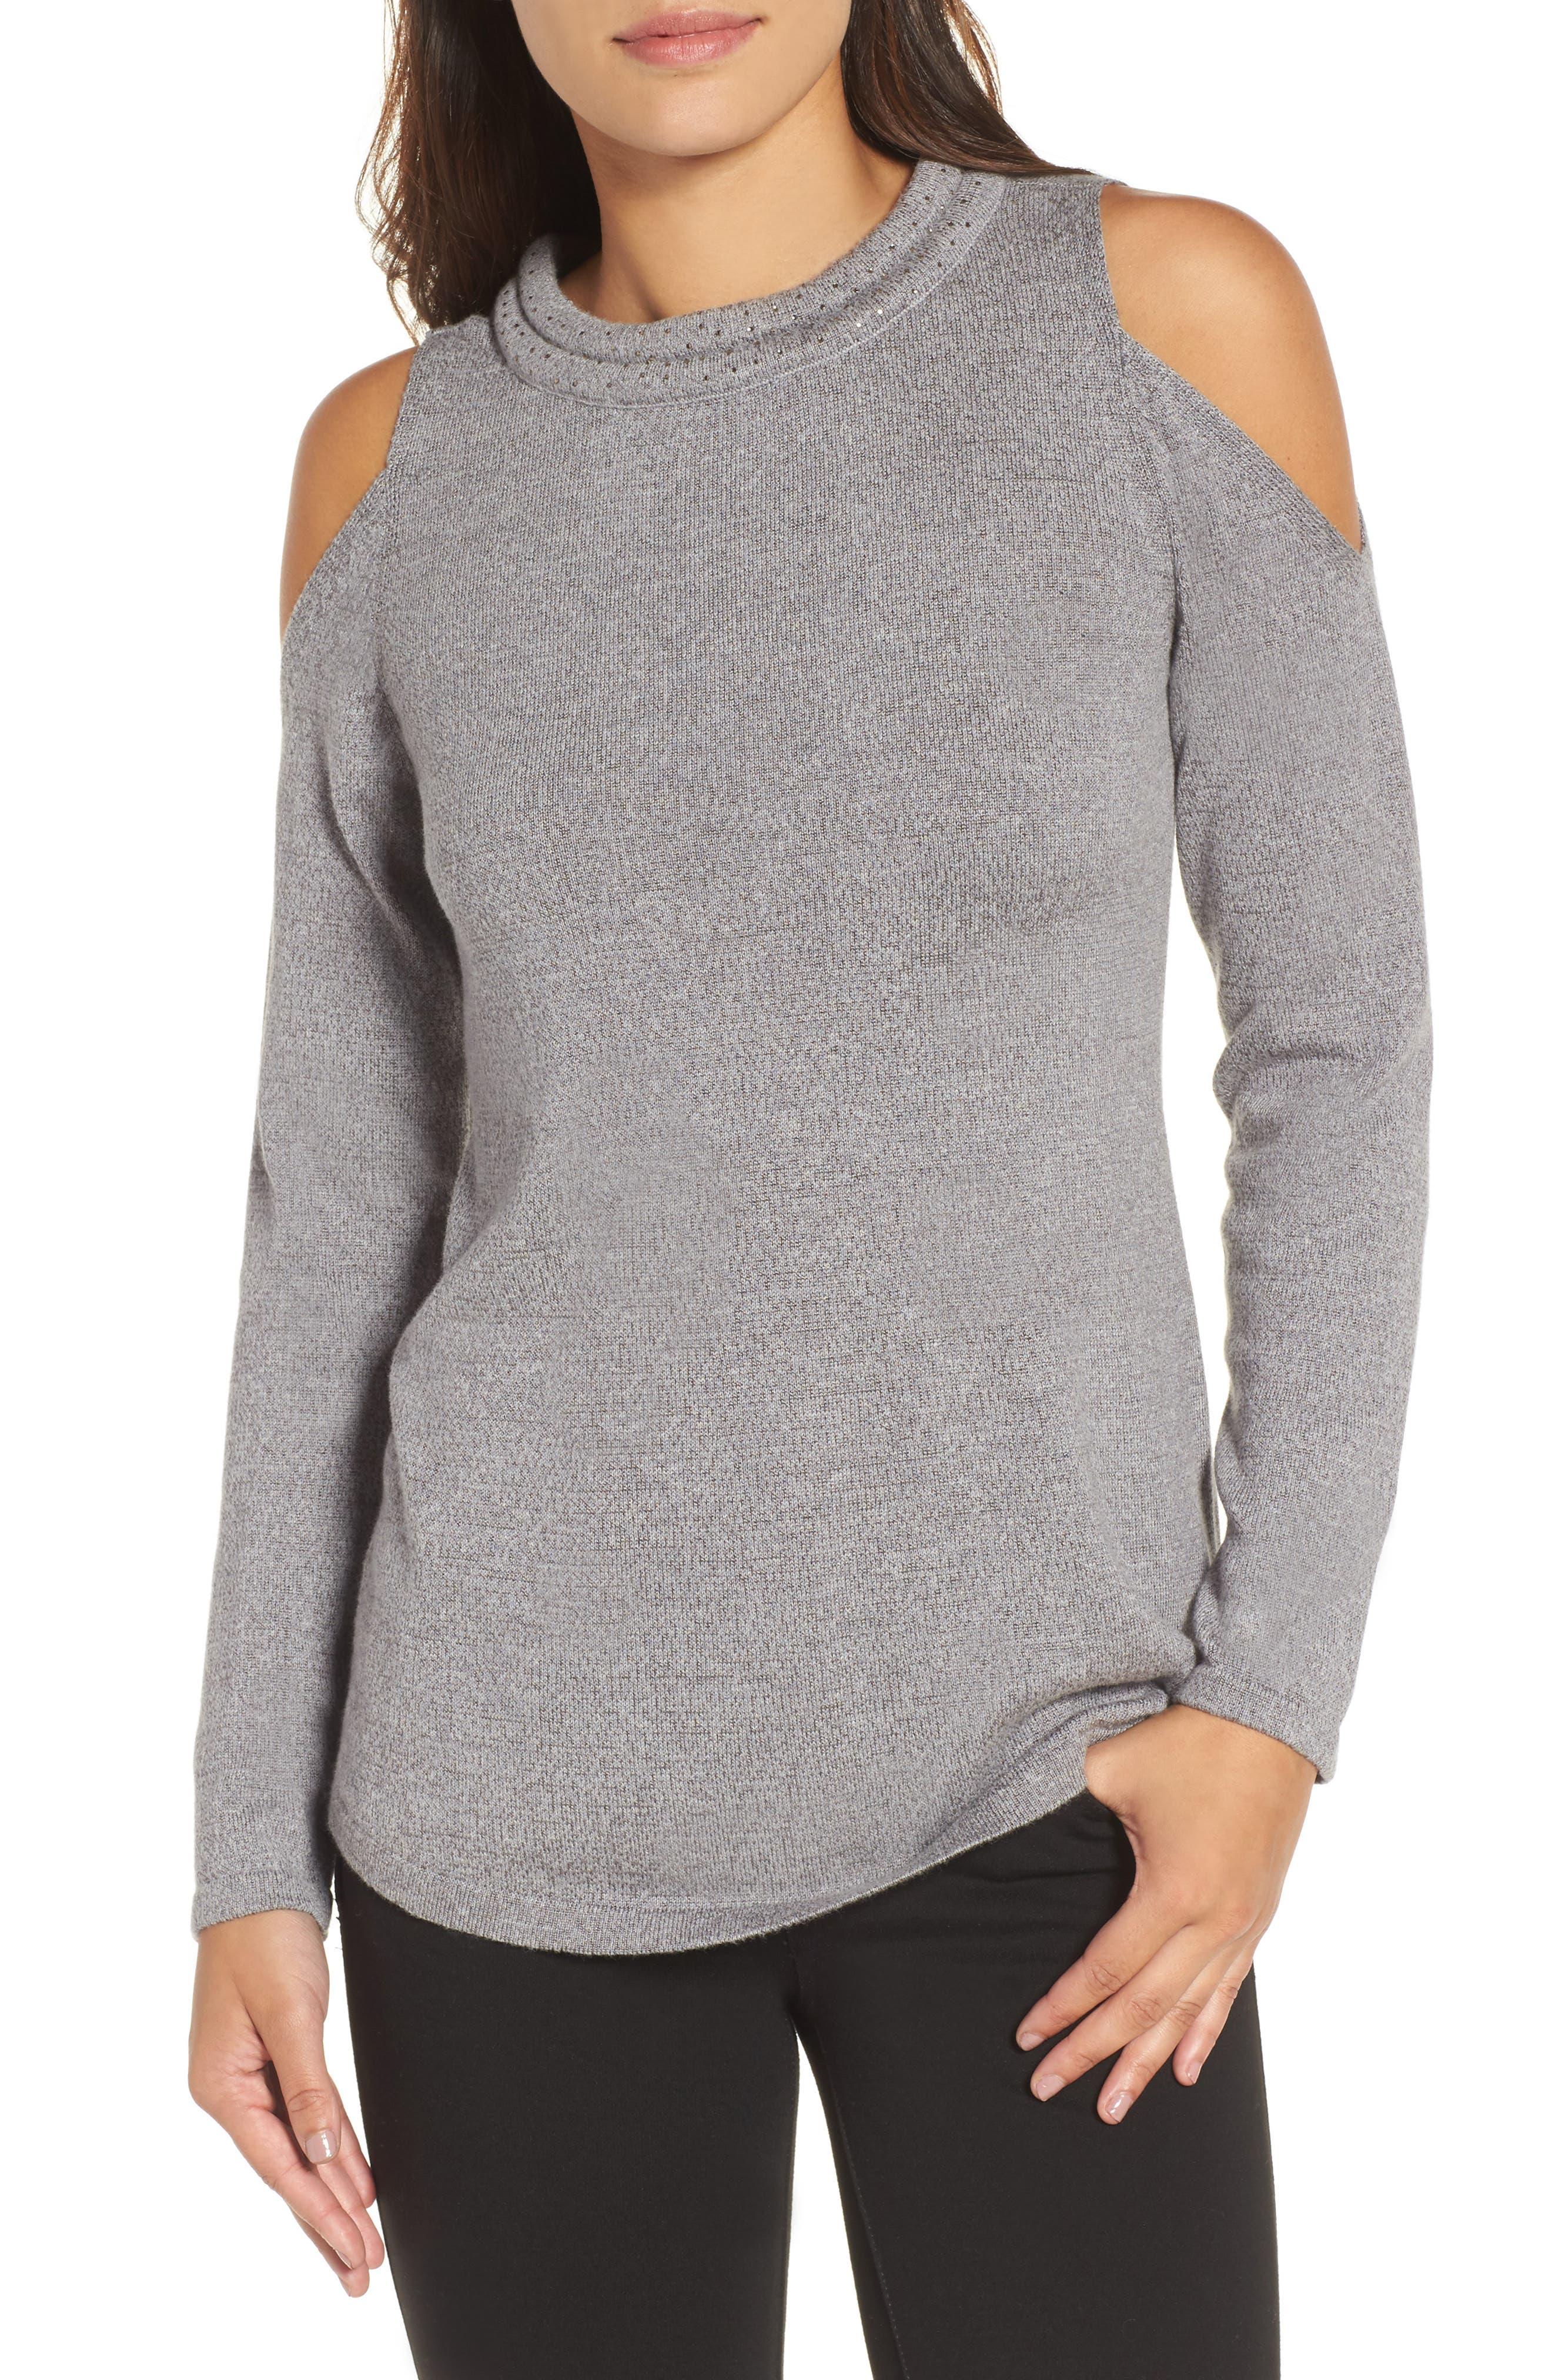 Alternate Image 1 Selected - NIC+ZOE Jewel Neck Cold Shoulder Top (Regular & Petite)